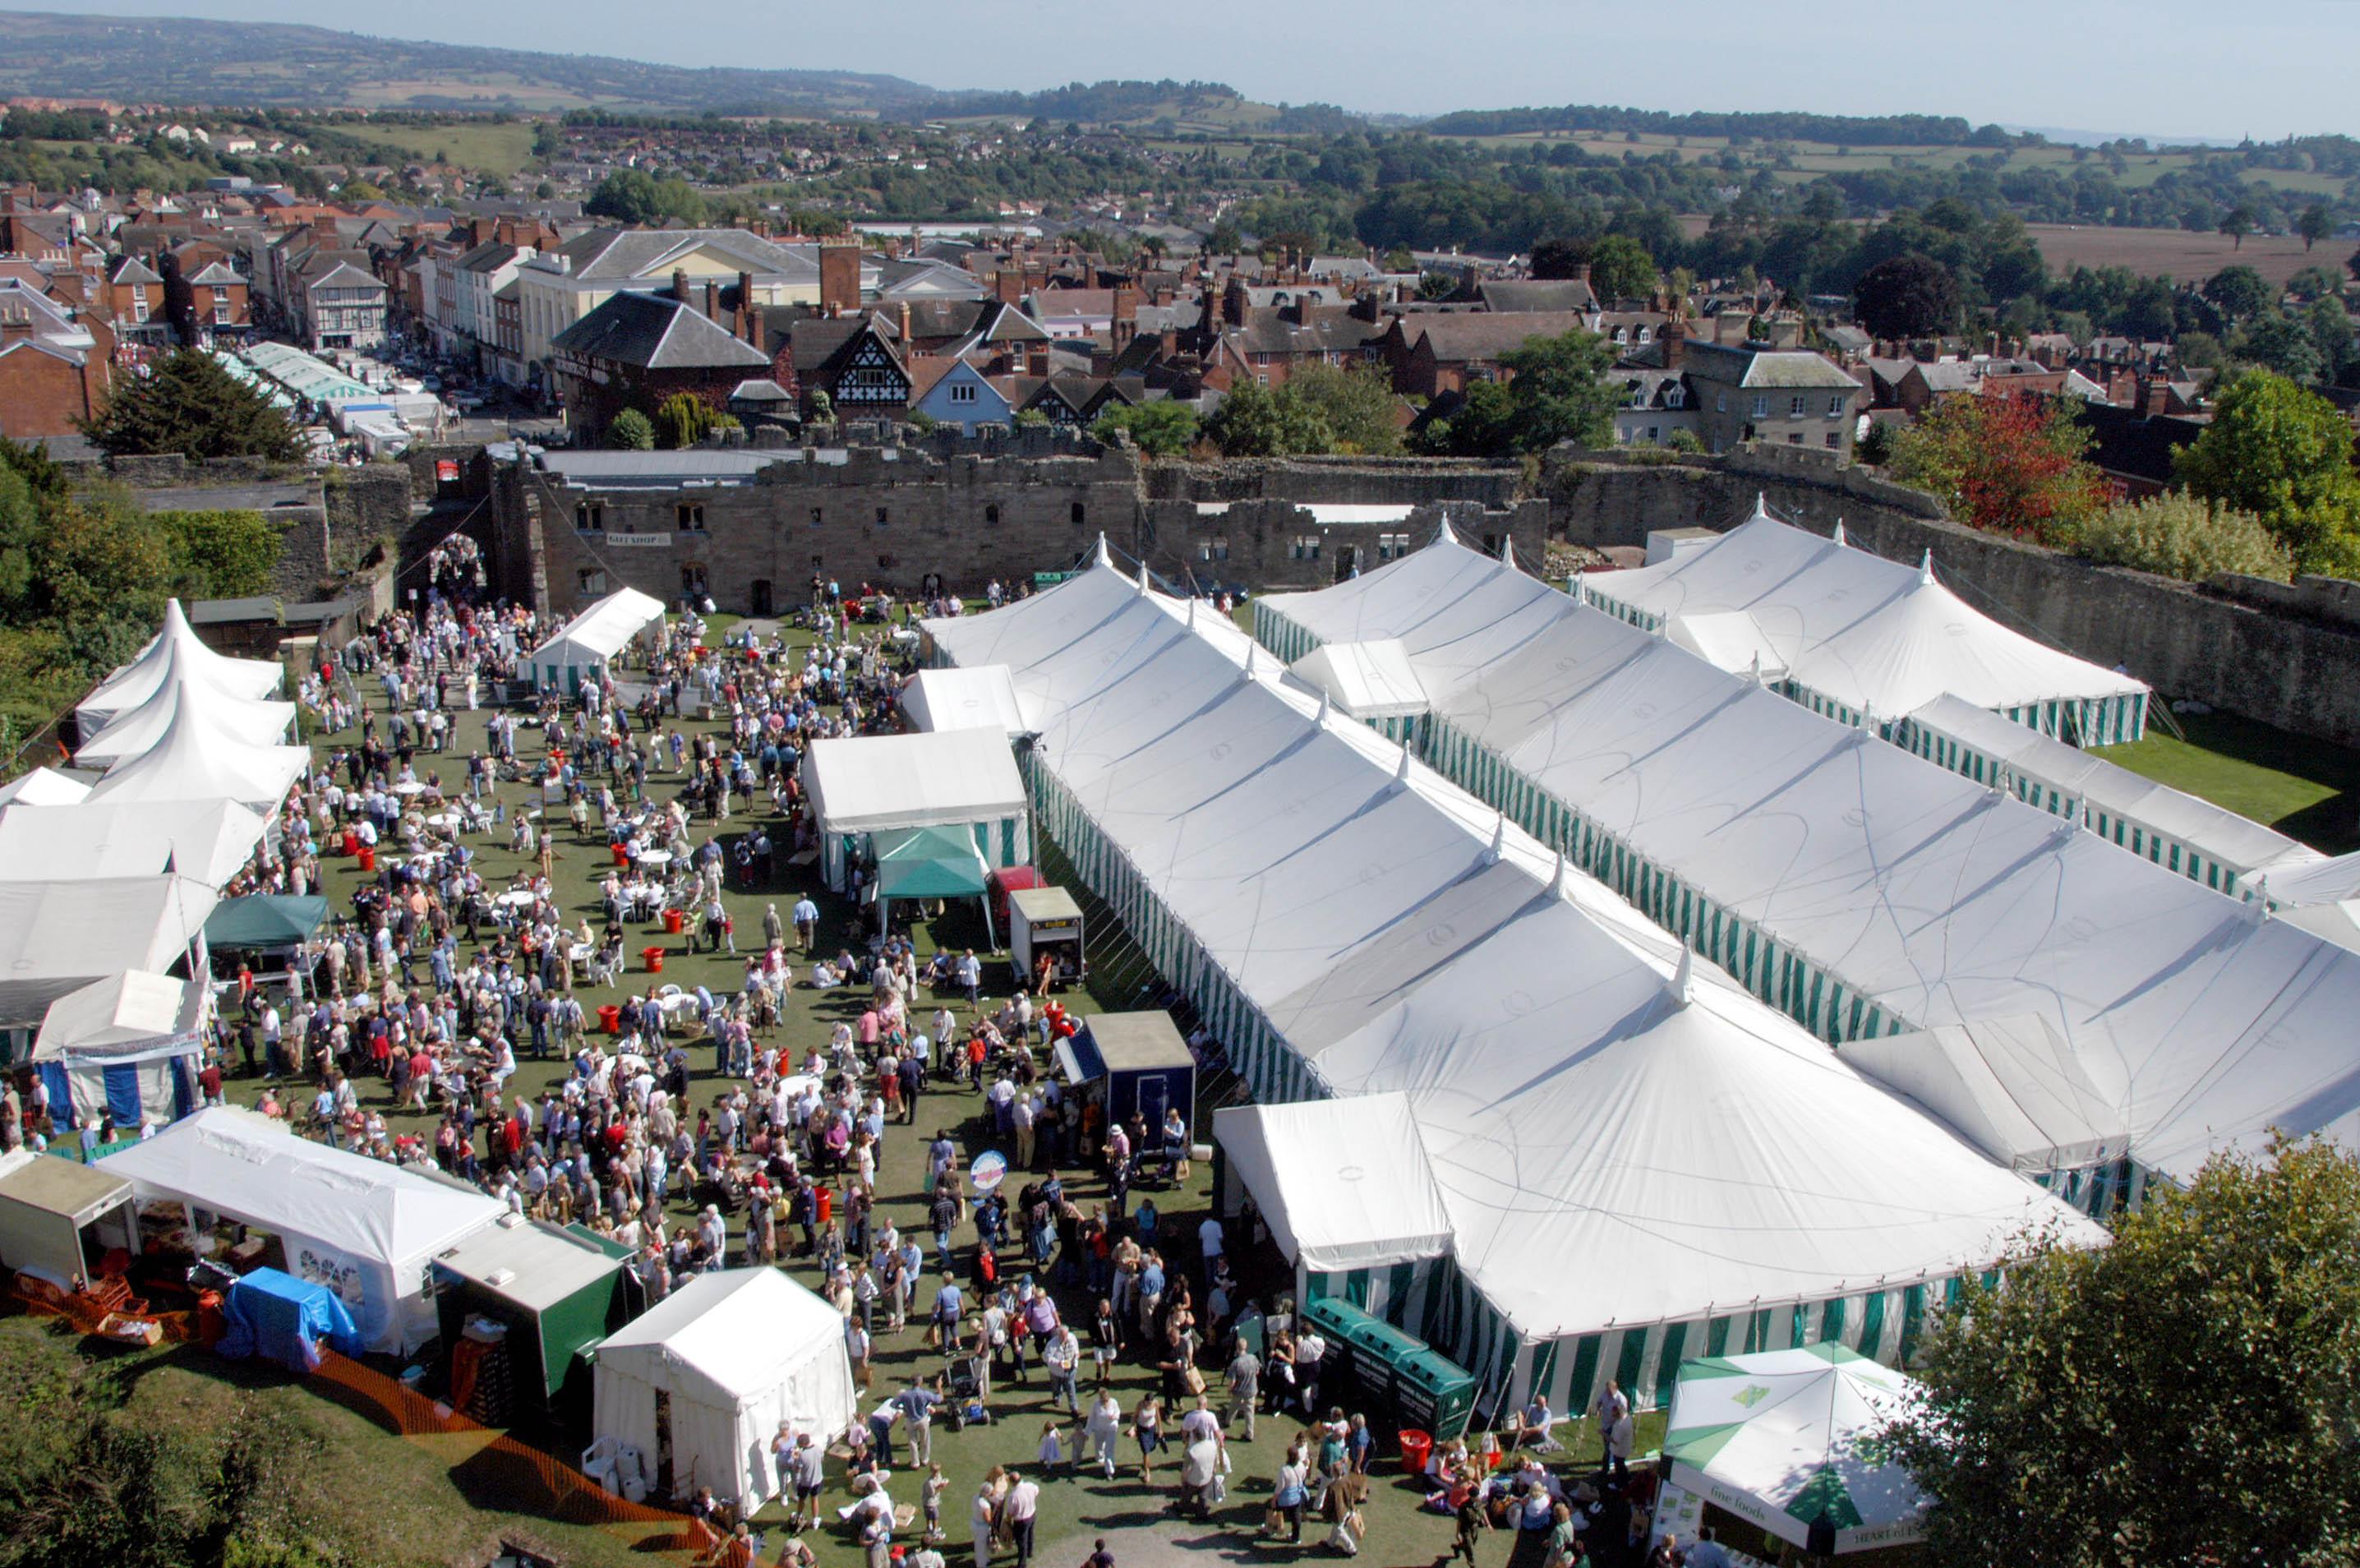 ludlow-food-festival